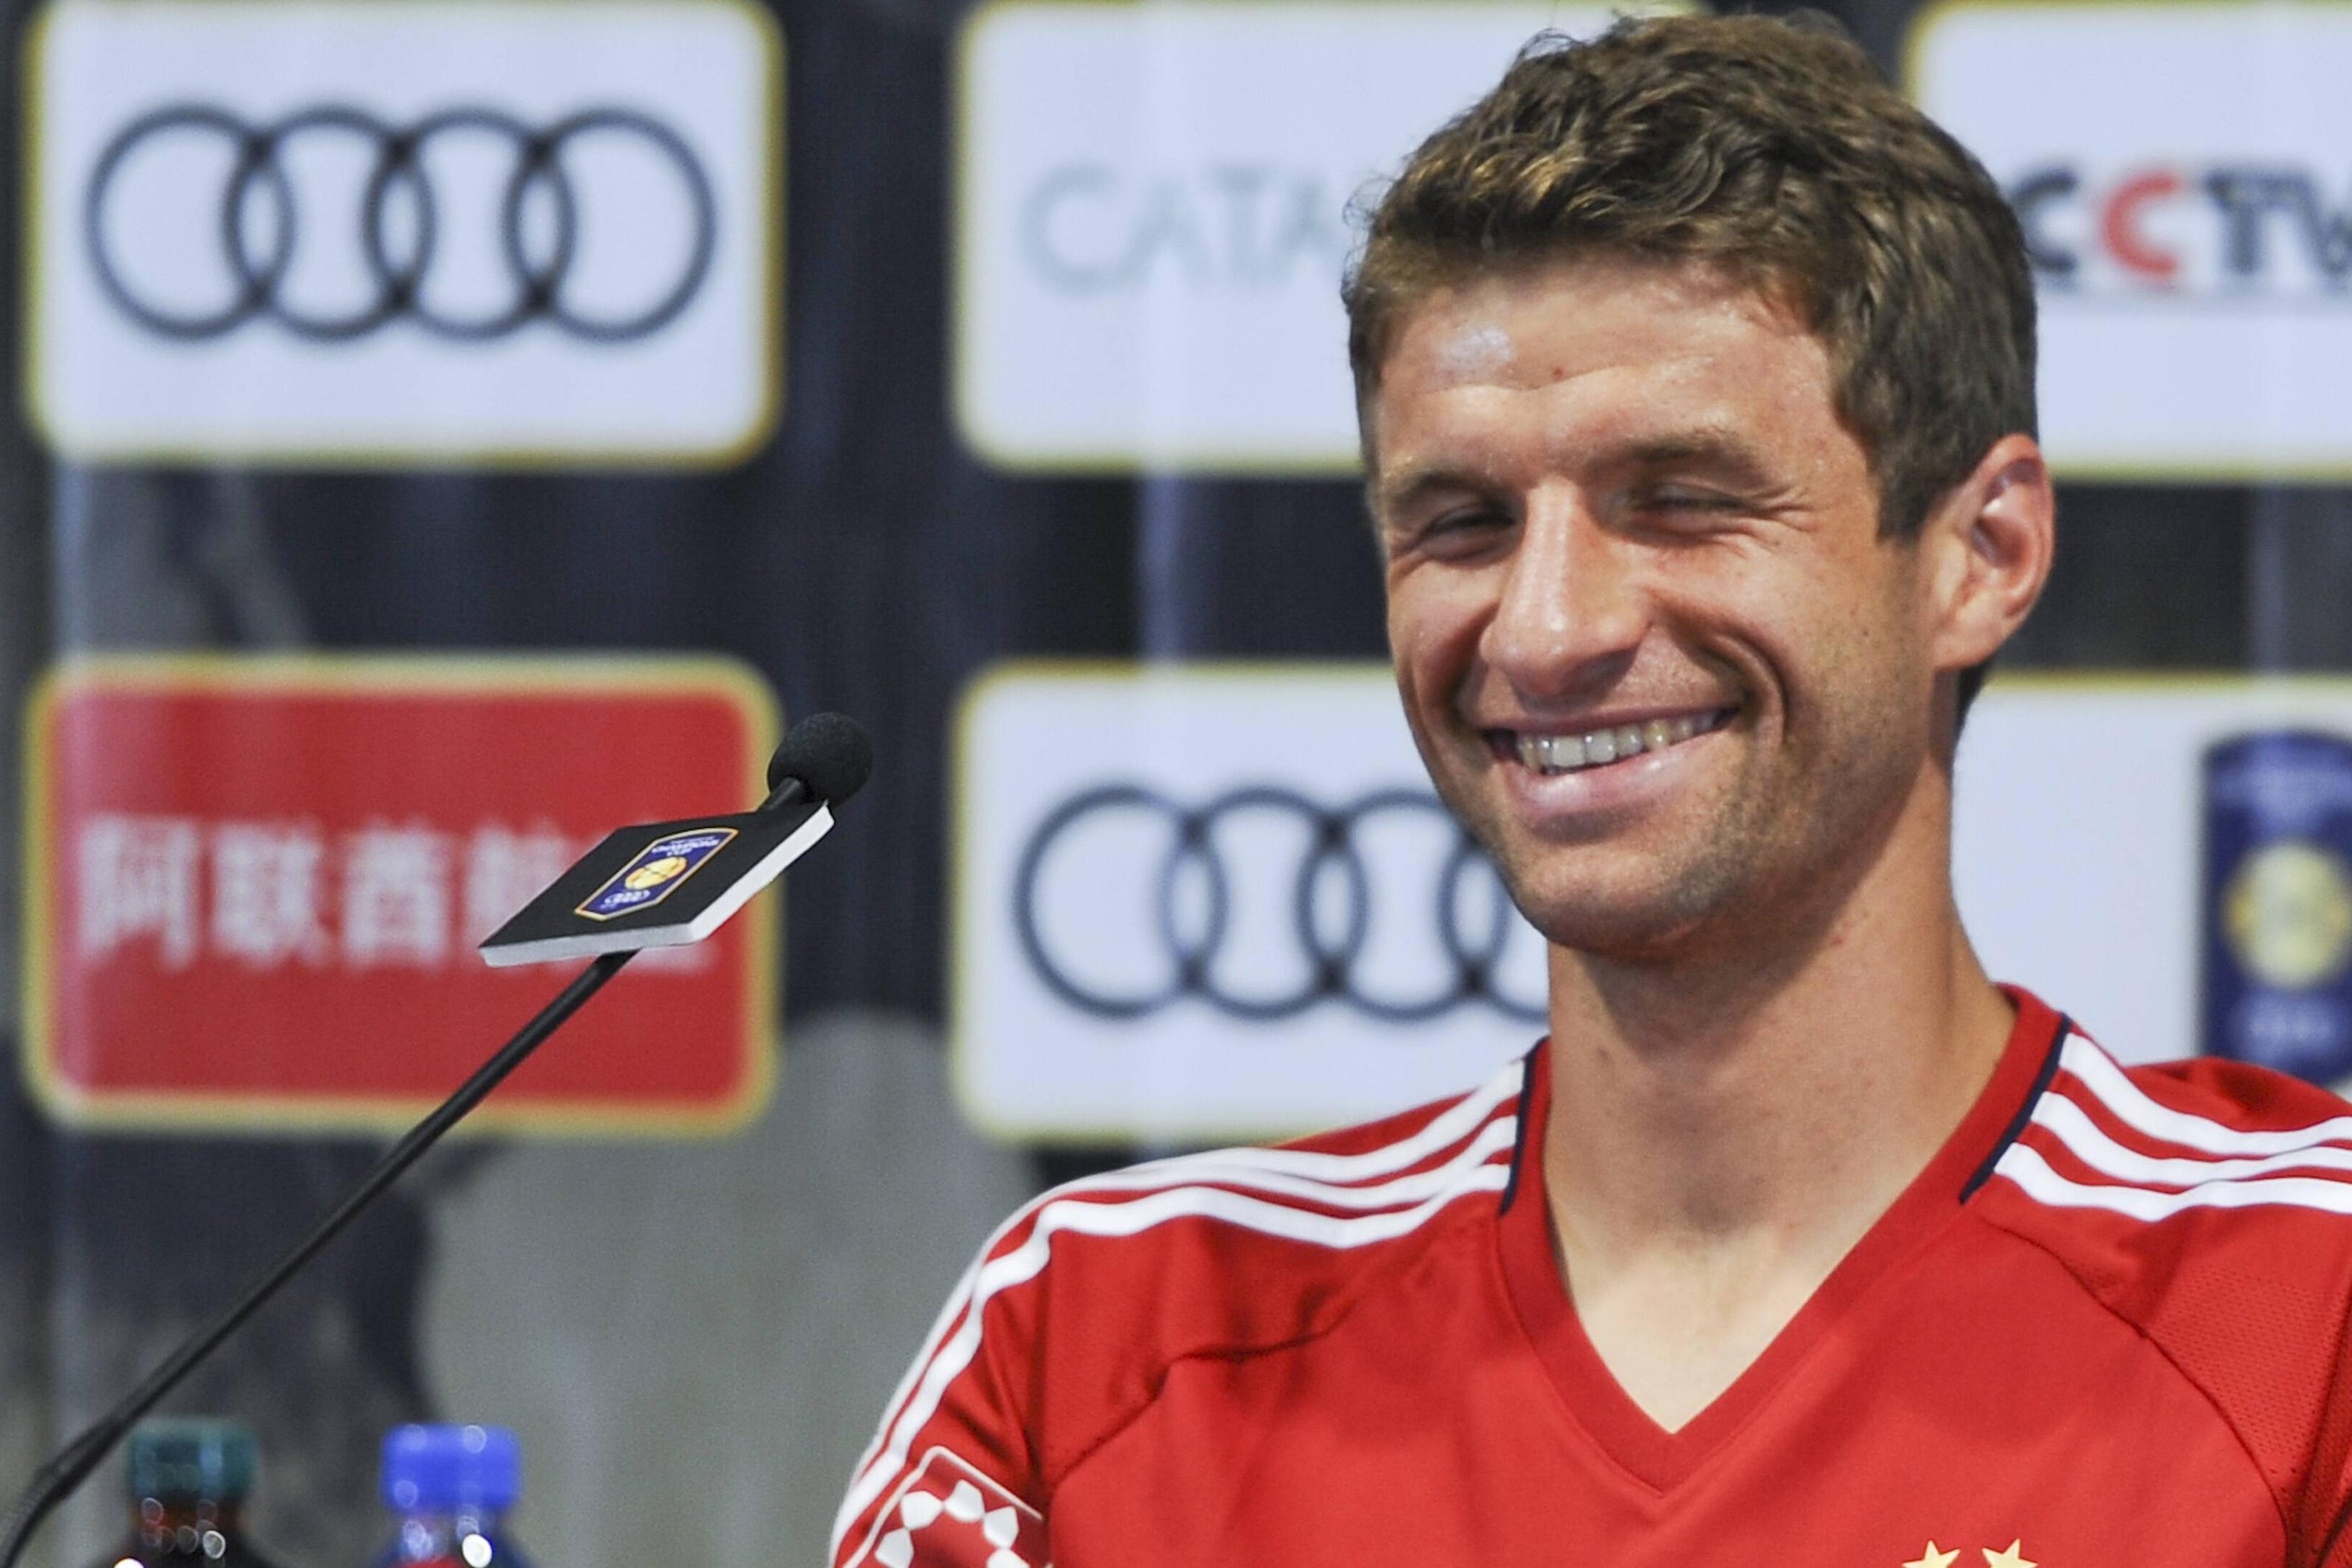 Bild zu FC Bayern München, Thomas Müller, Shanghai, Trainingslager